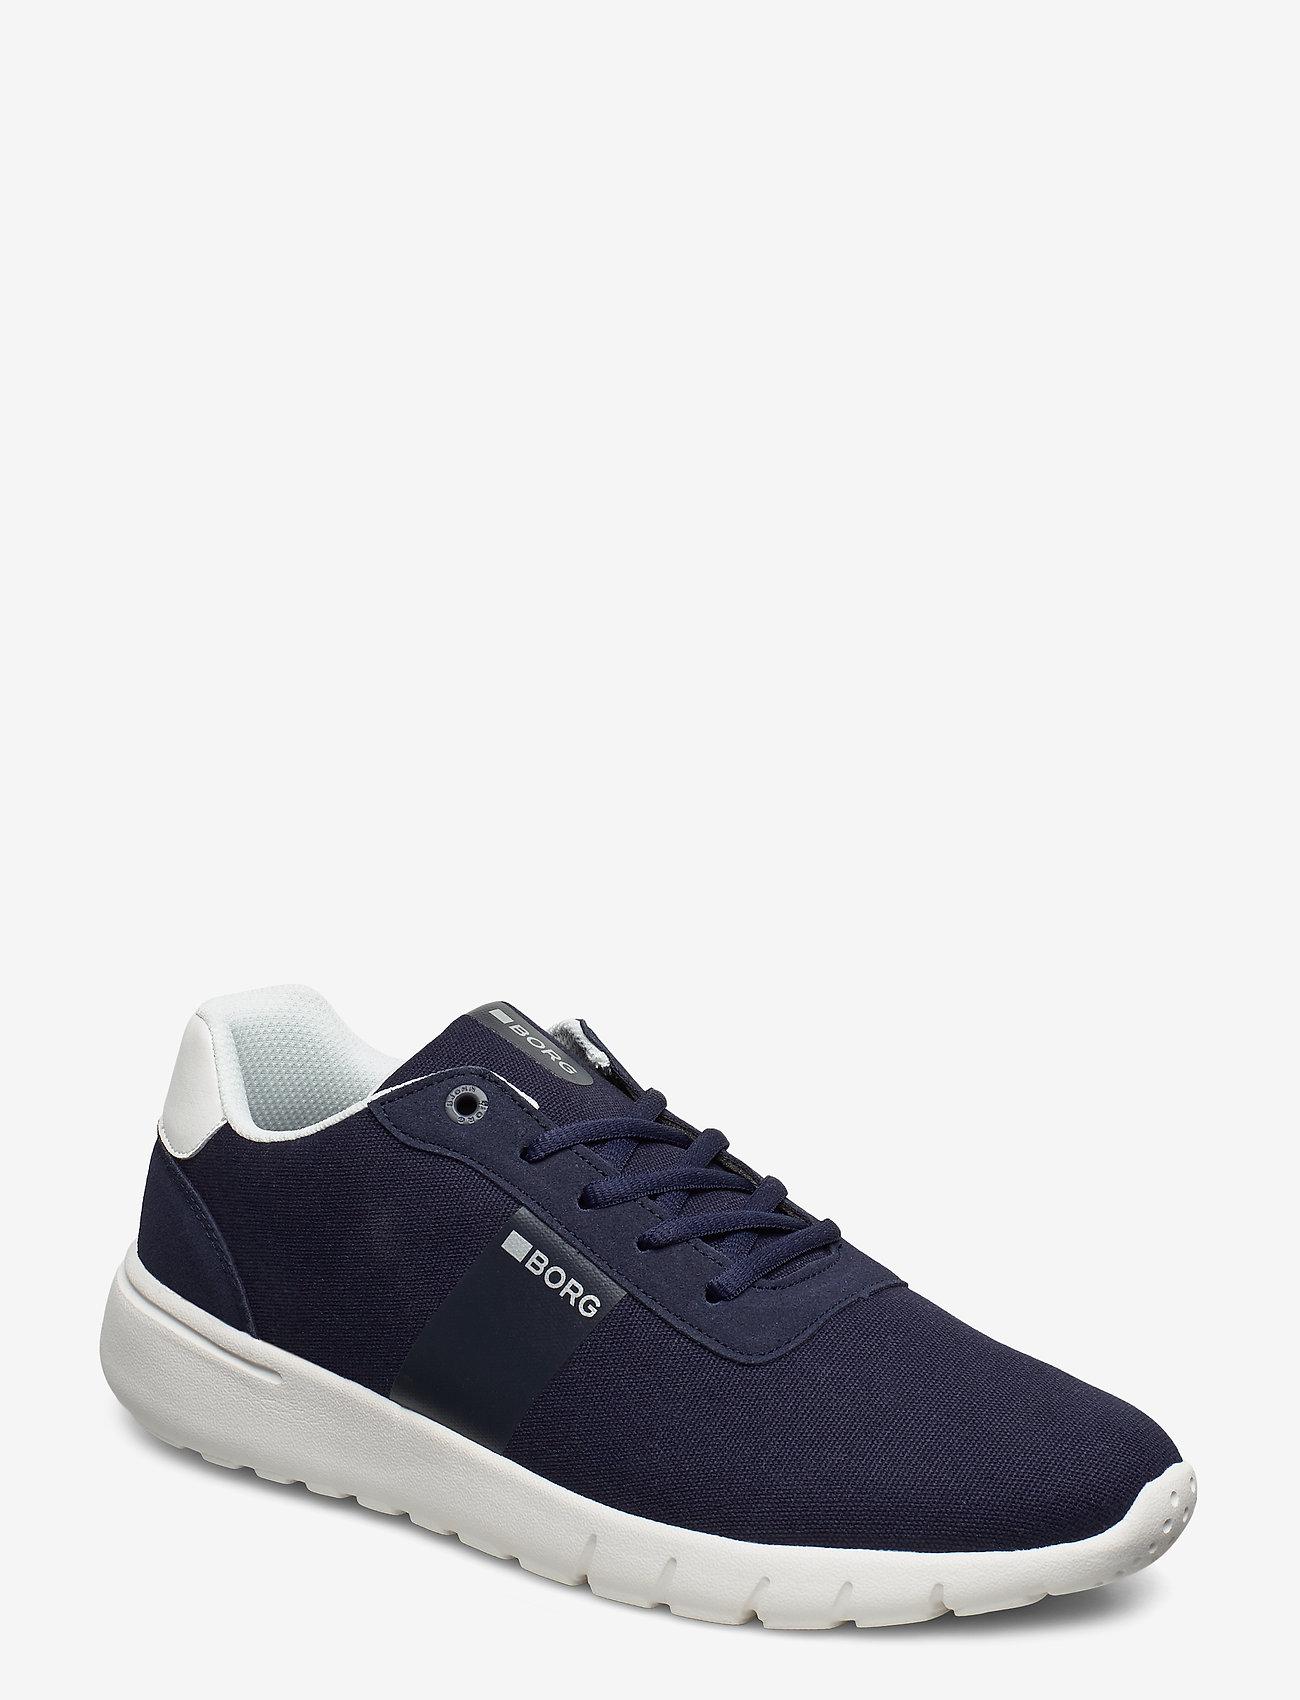 Björn Borg - R1060 CVS M - laag sneakers - navy - 0